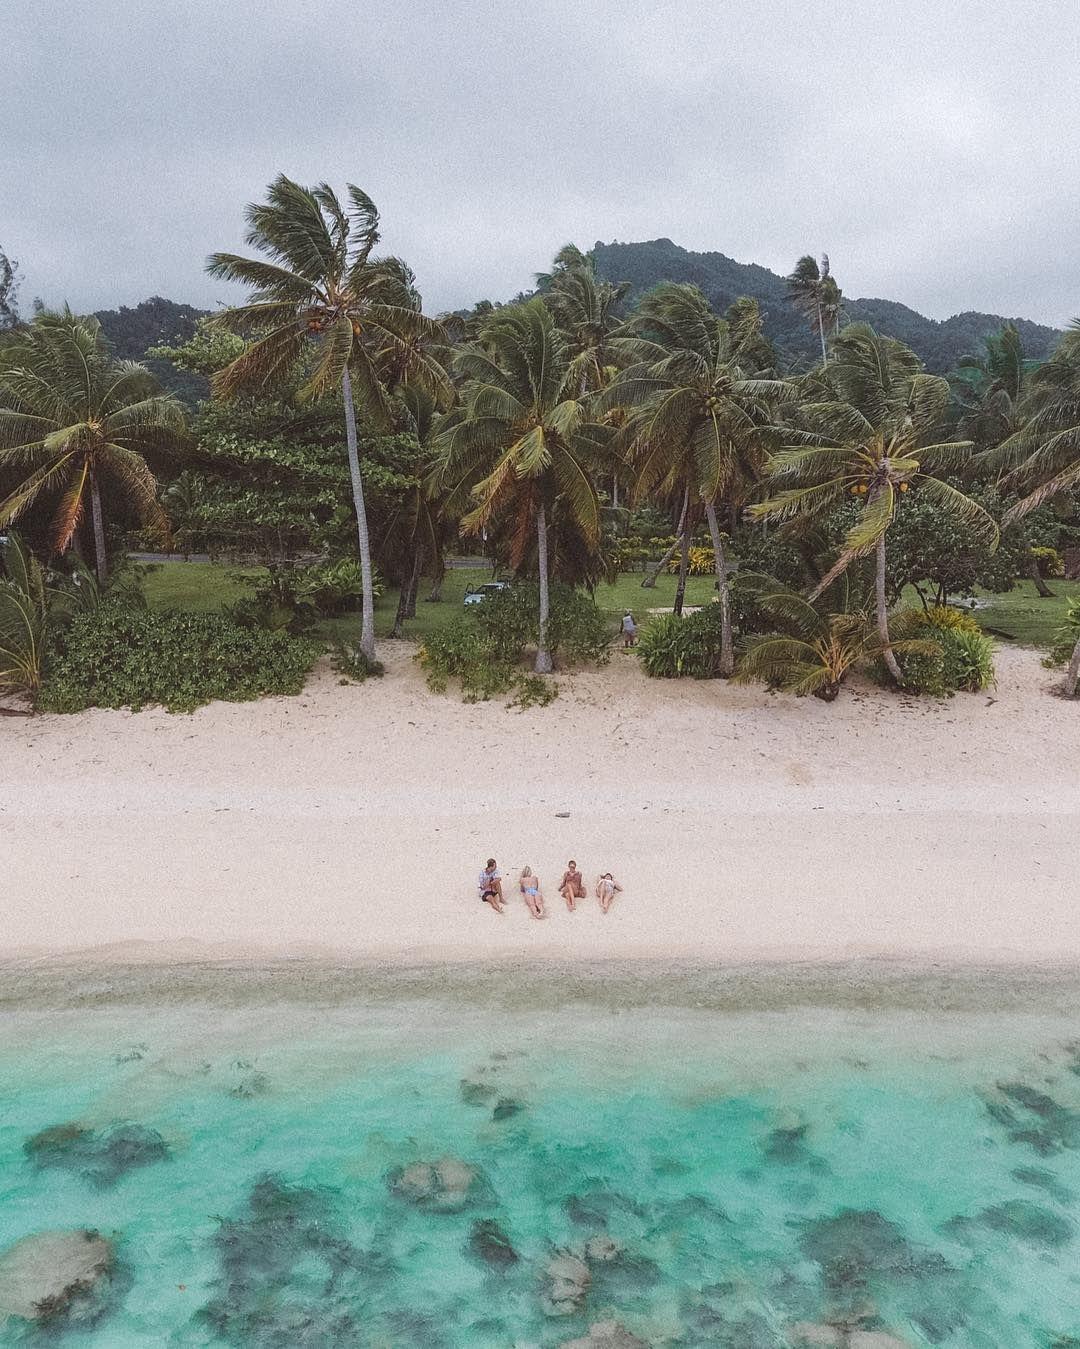 Cook Islands Beaches: Instagram, Photography